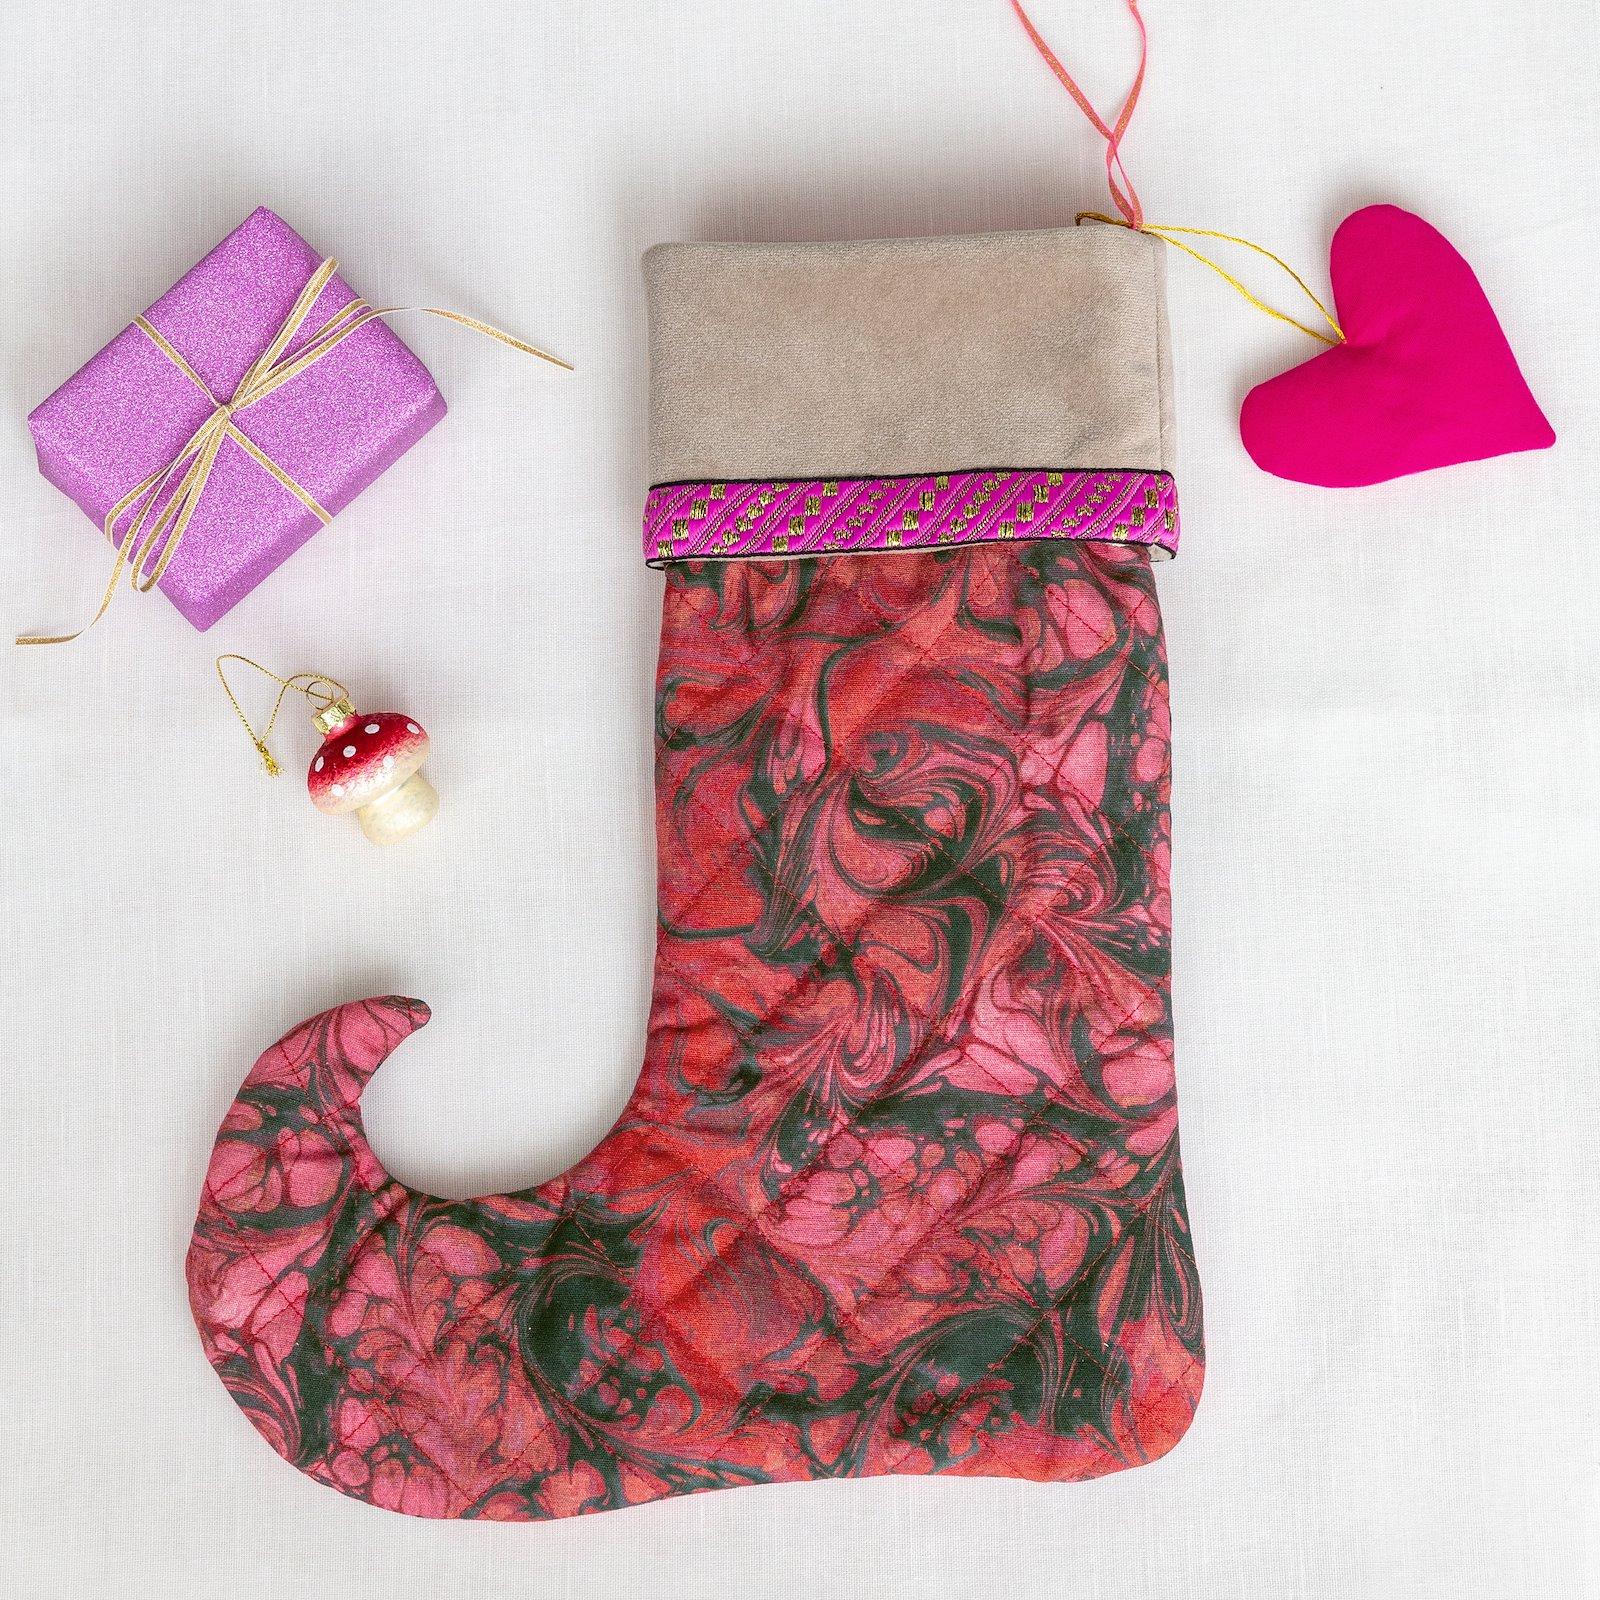 Christmas sock and heart p90311_780570_824158_22334_21436_p90333_4210_35290_sskit